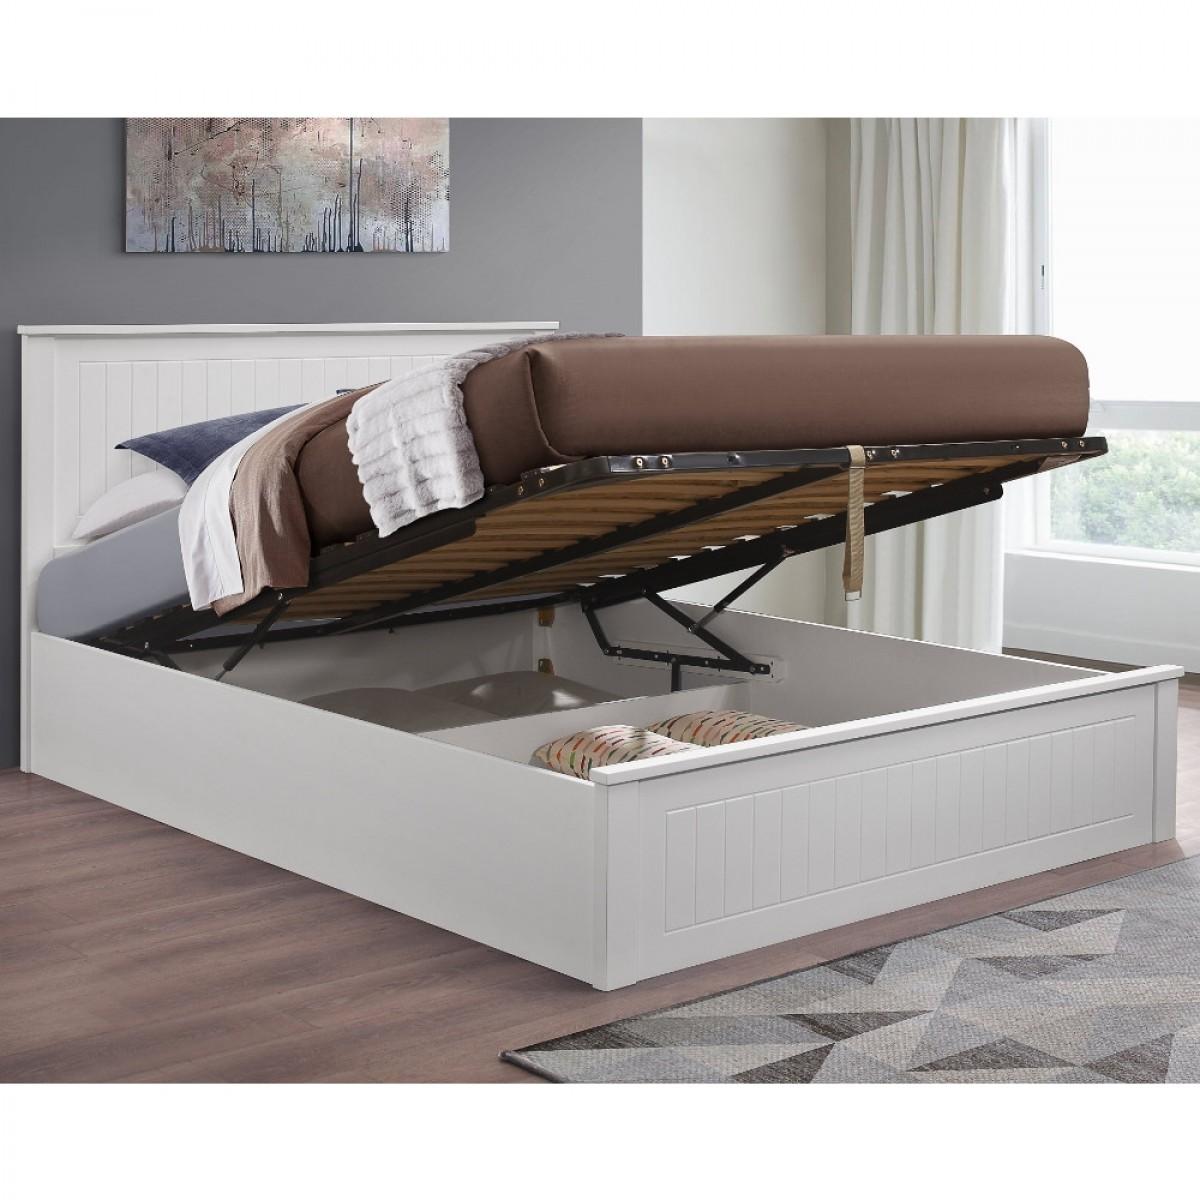 Fairmont White Wooden Ottoman Storage Bed